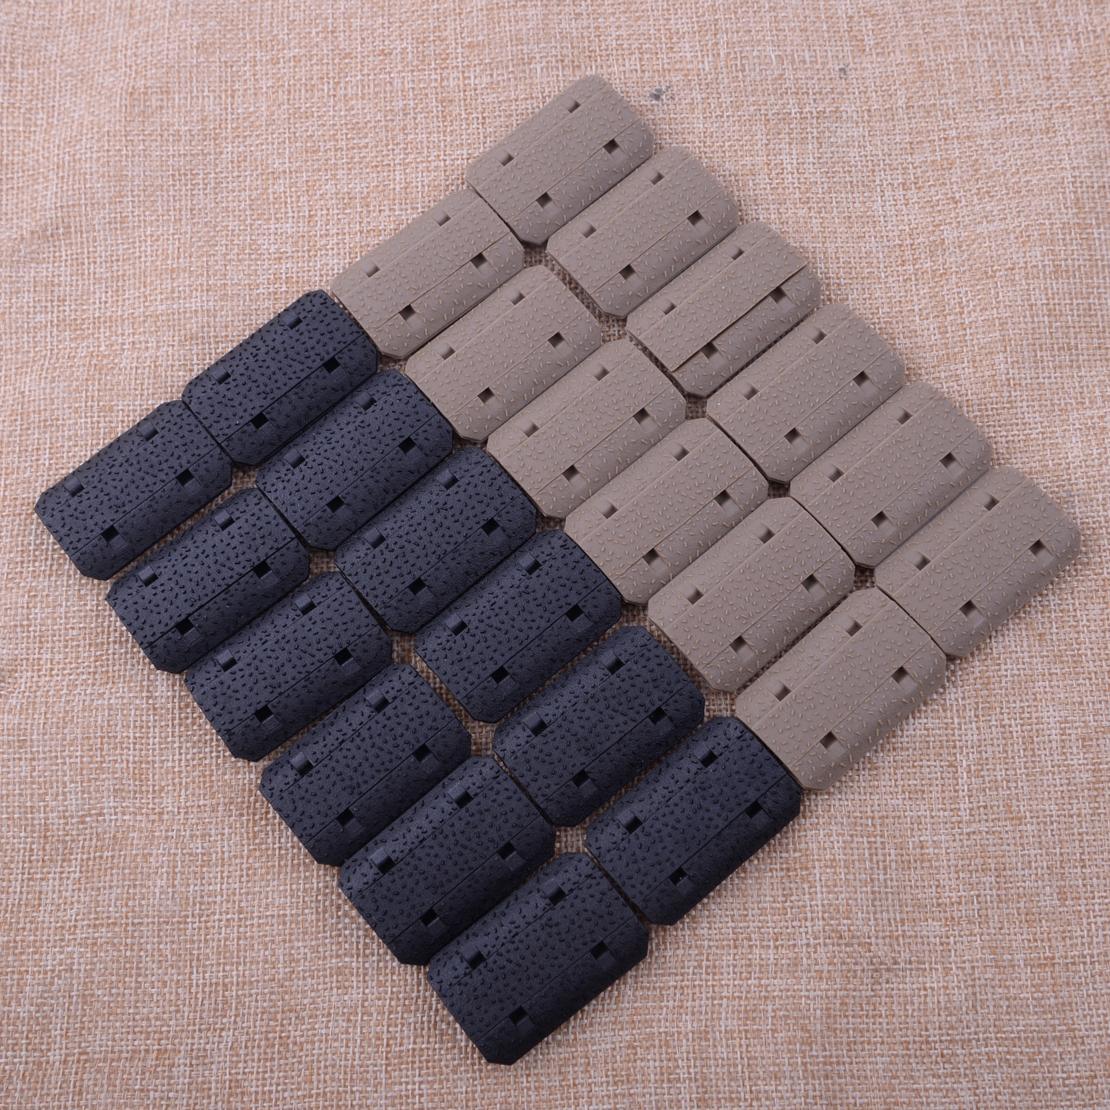 12Pcs Tactical Type 2 Rail Covers fit M-lok Hand Guard Panel Grip Mount